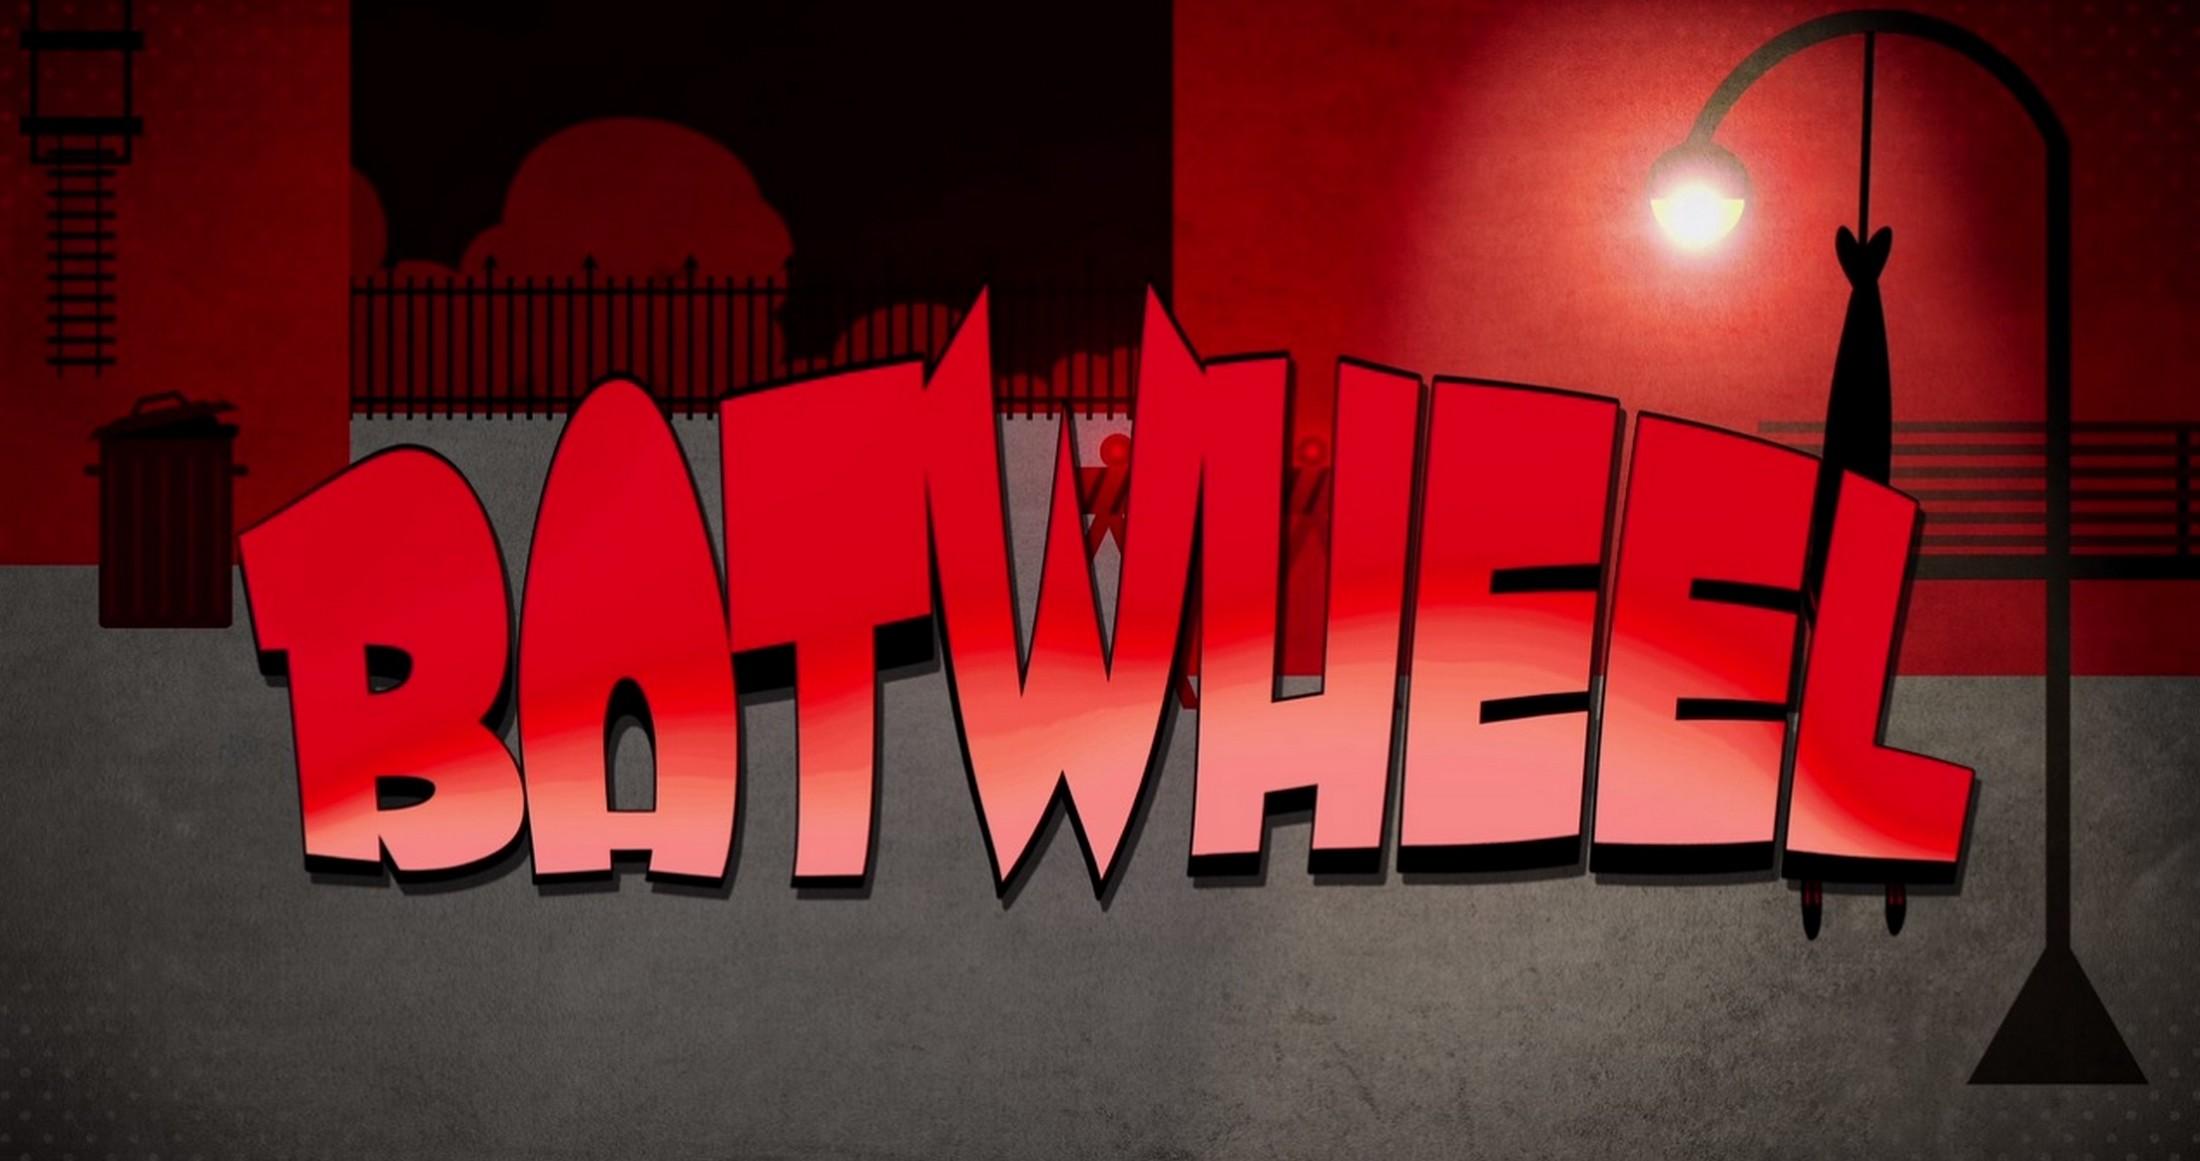 Batwheel Major Productions